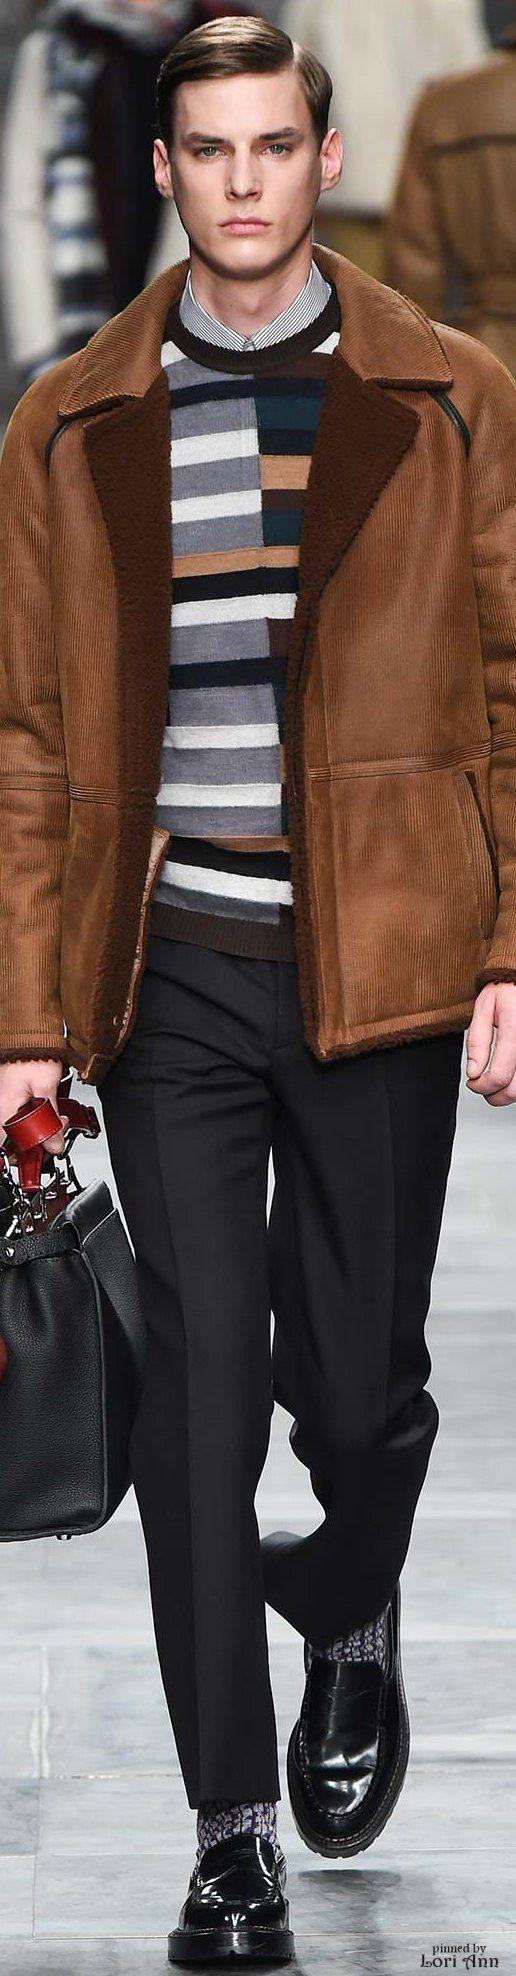 Fendi 2015   Menswear   Men's Fashion   Men's Outfit for Fall/Winter   Smart Casual   Moda Masculina   Shop at designerclothingfans.com